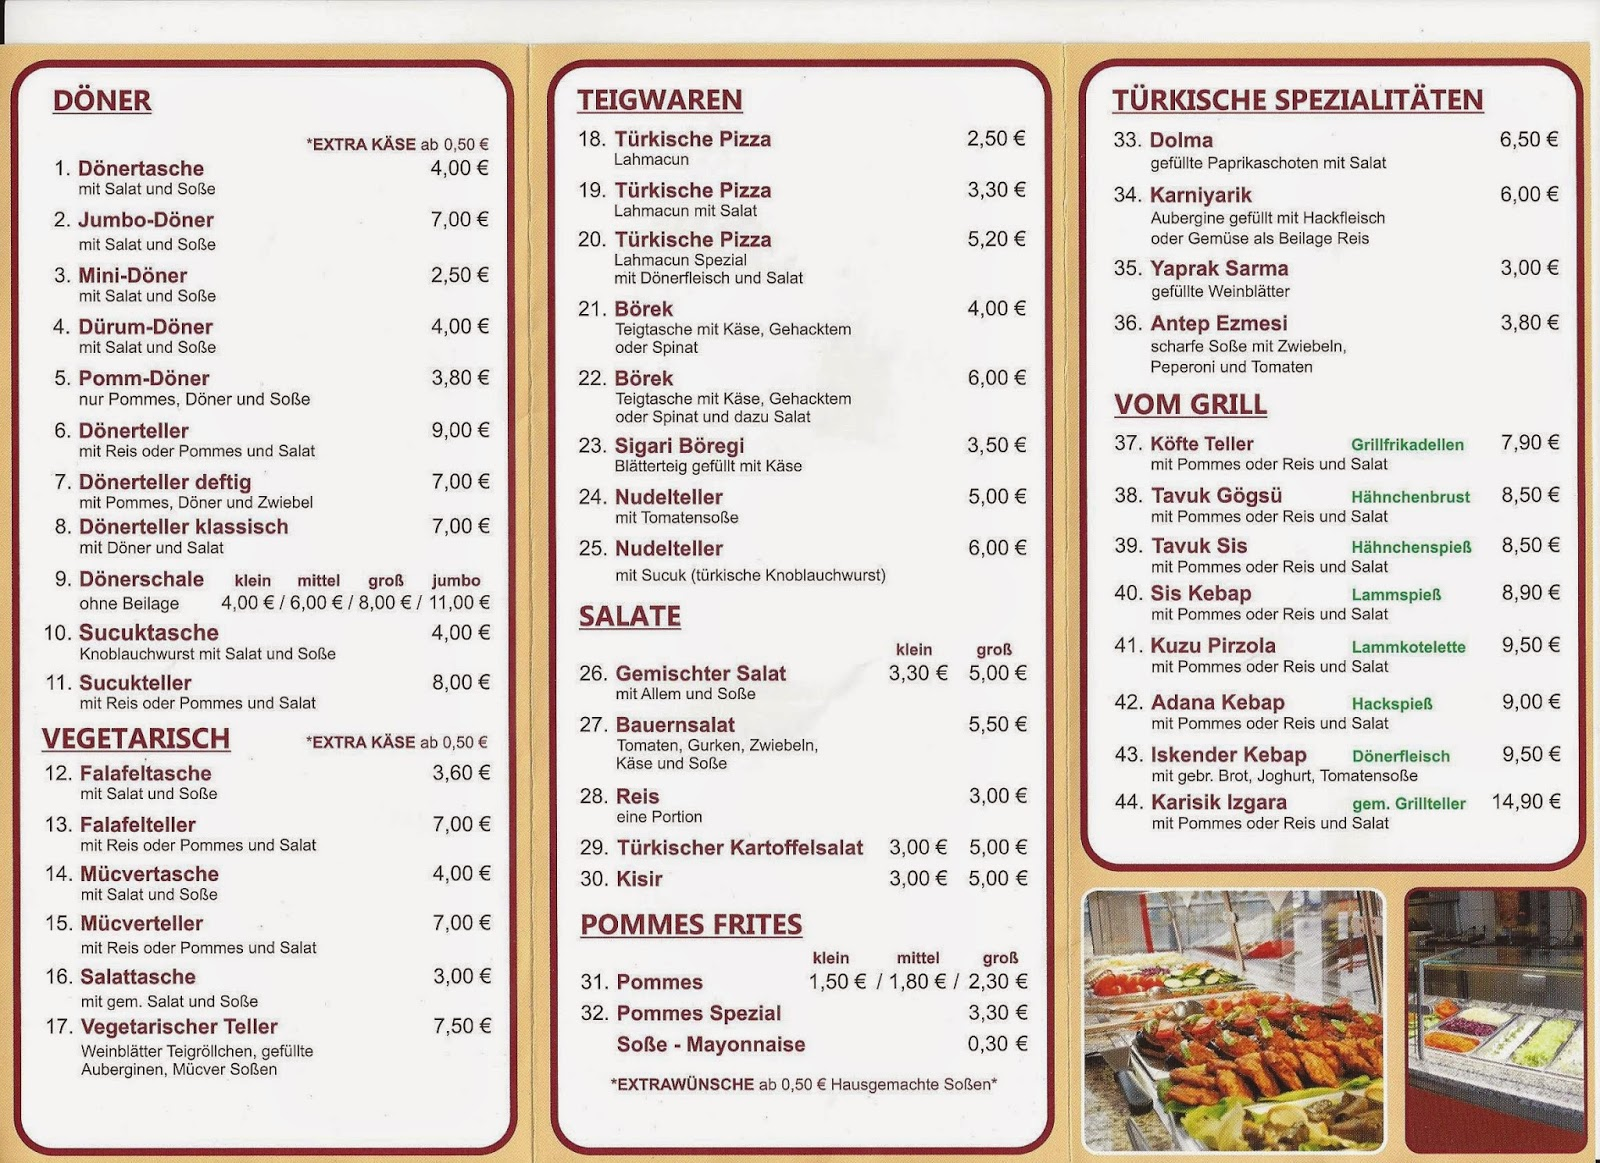 Atemberaubend Pizza Menü Vorlagen Fotos - Entry Level Resume ...